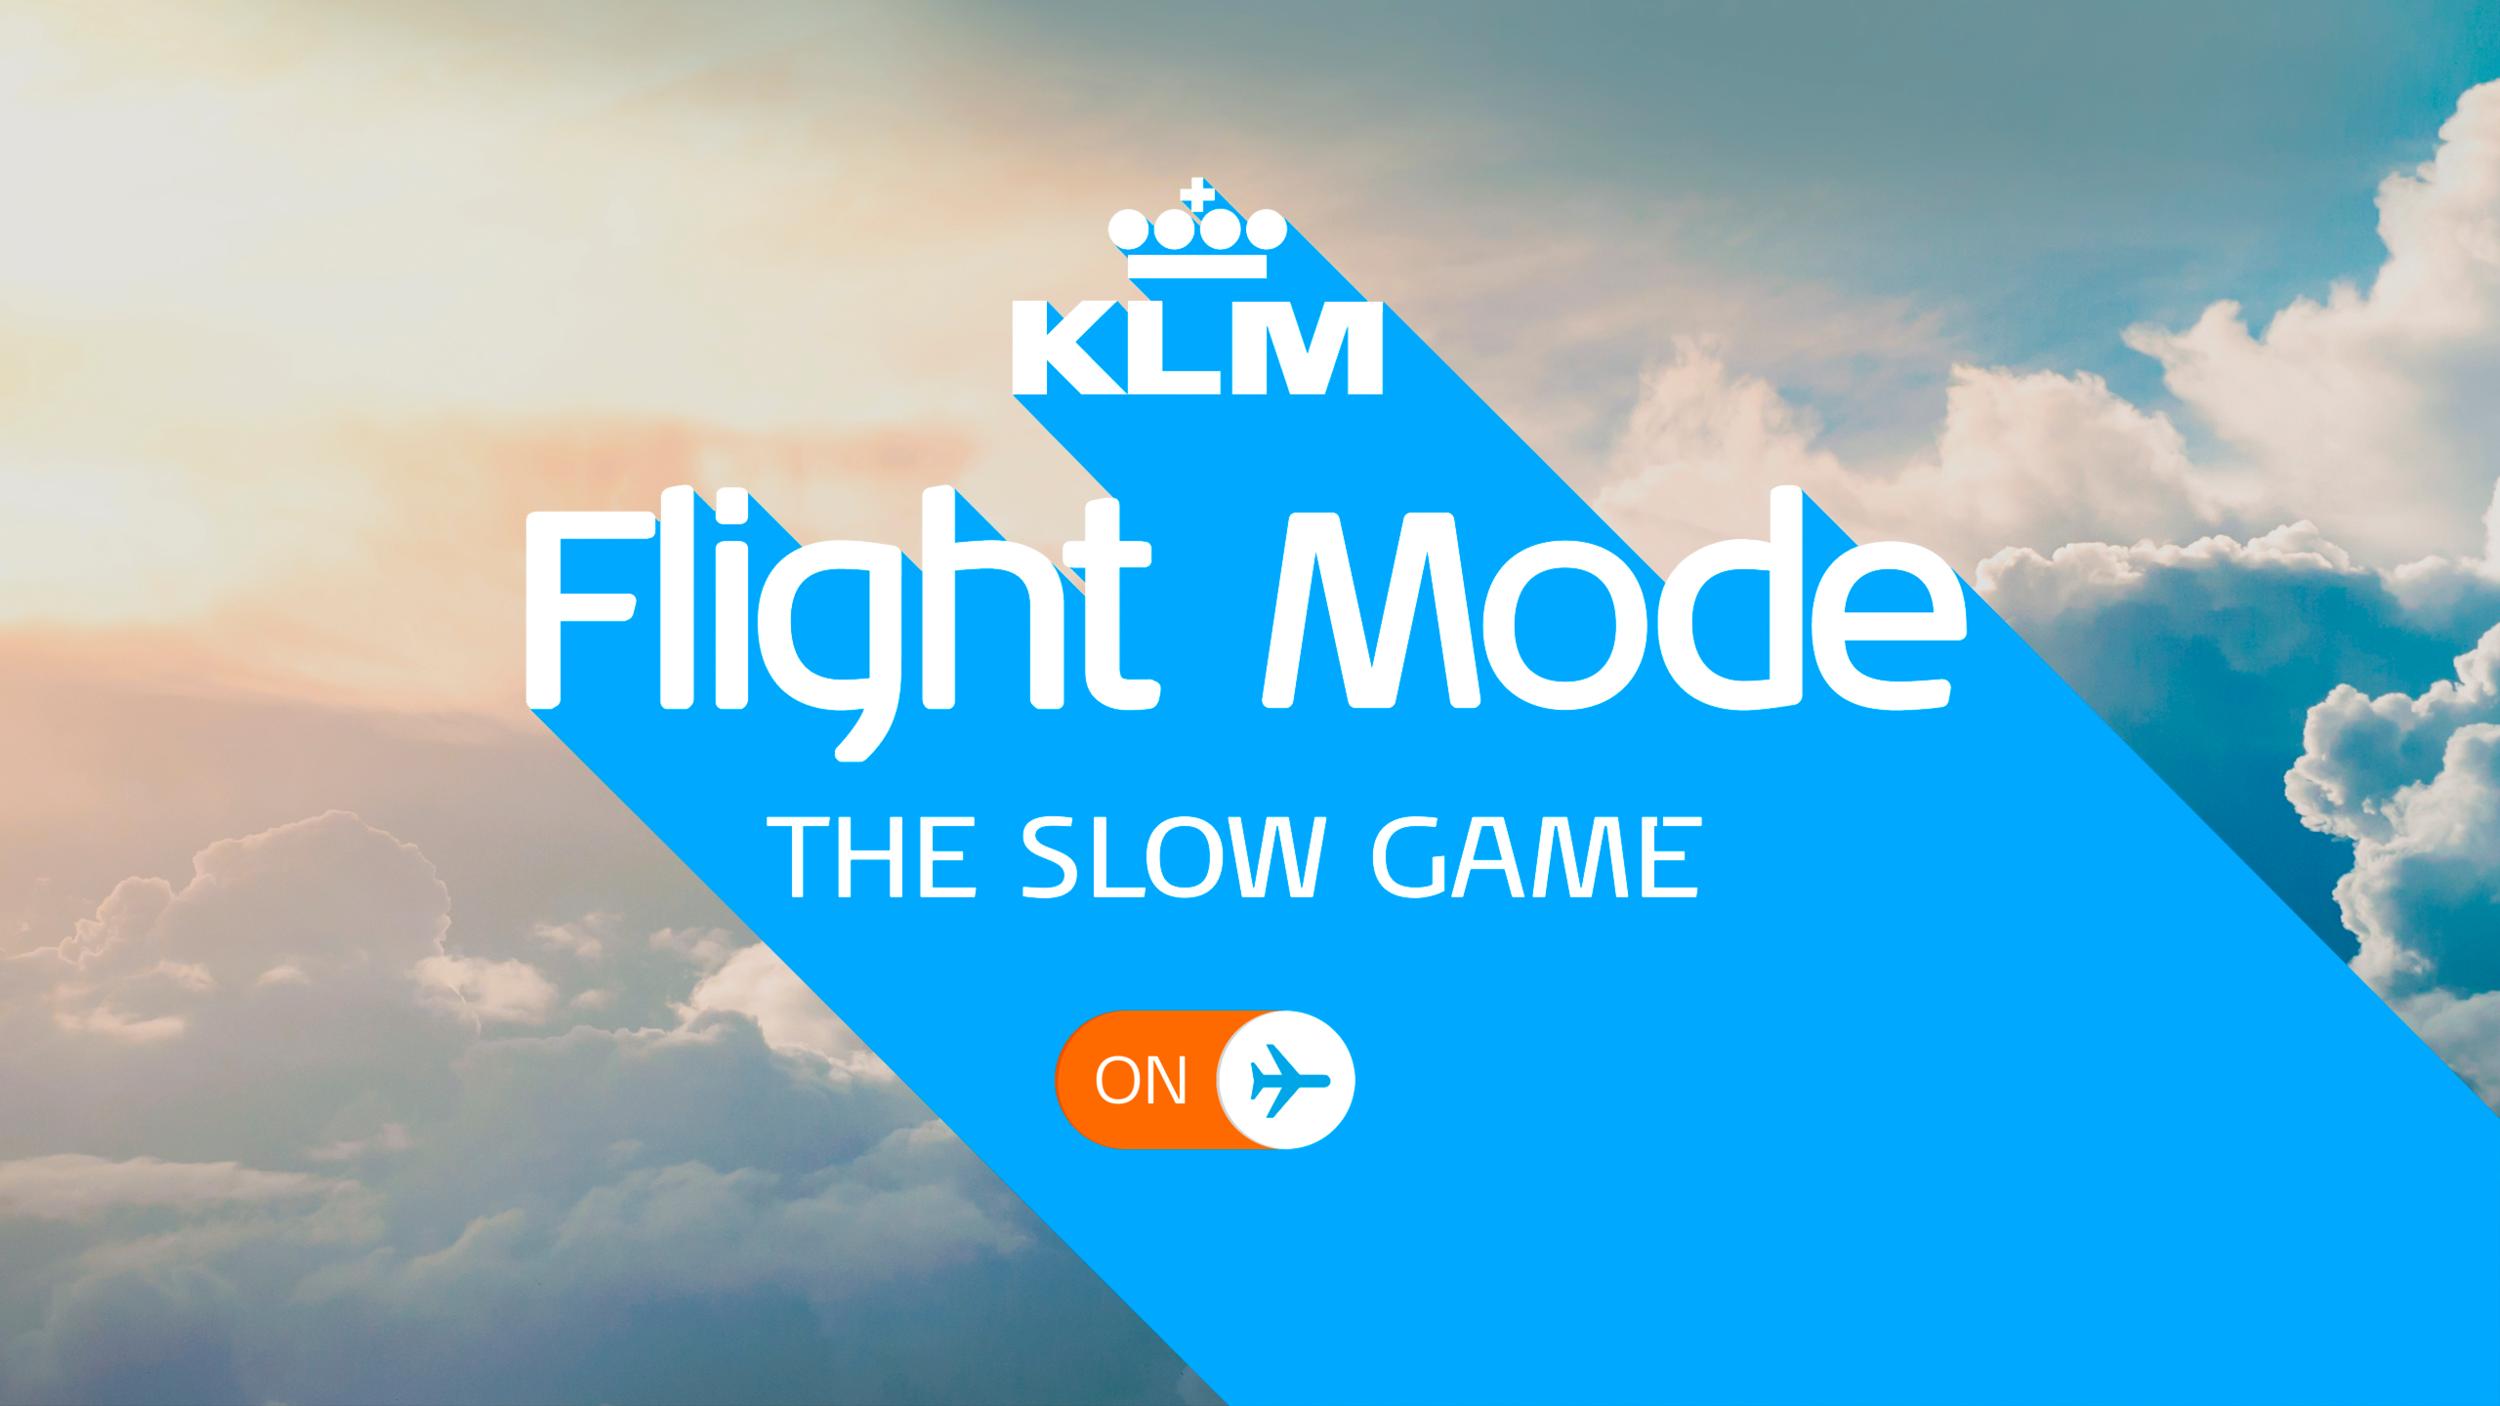 KLM-FLIGHT-MODE-_1.png